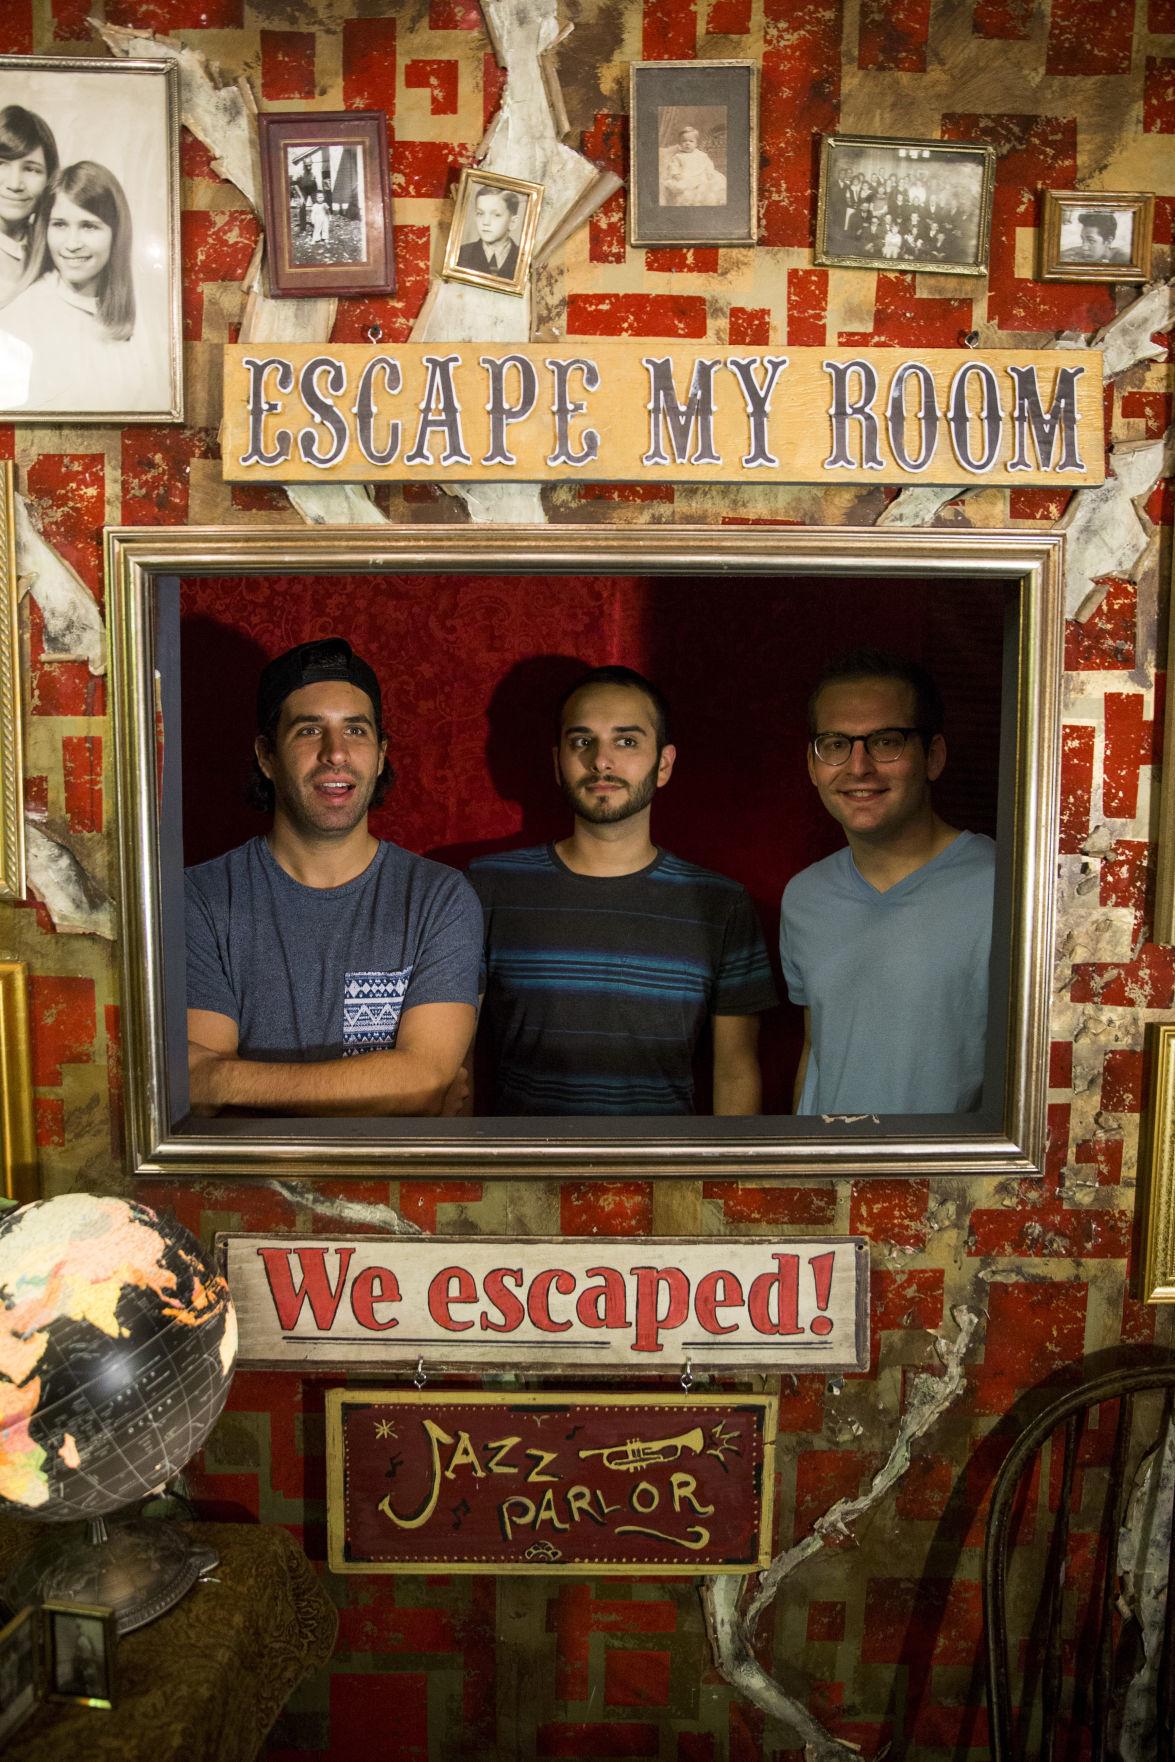 escapemyroomnb_SG_10.JPG